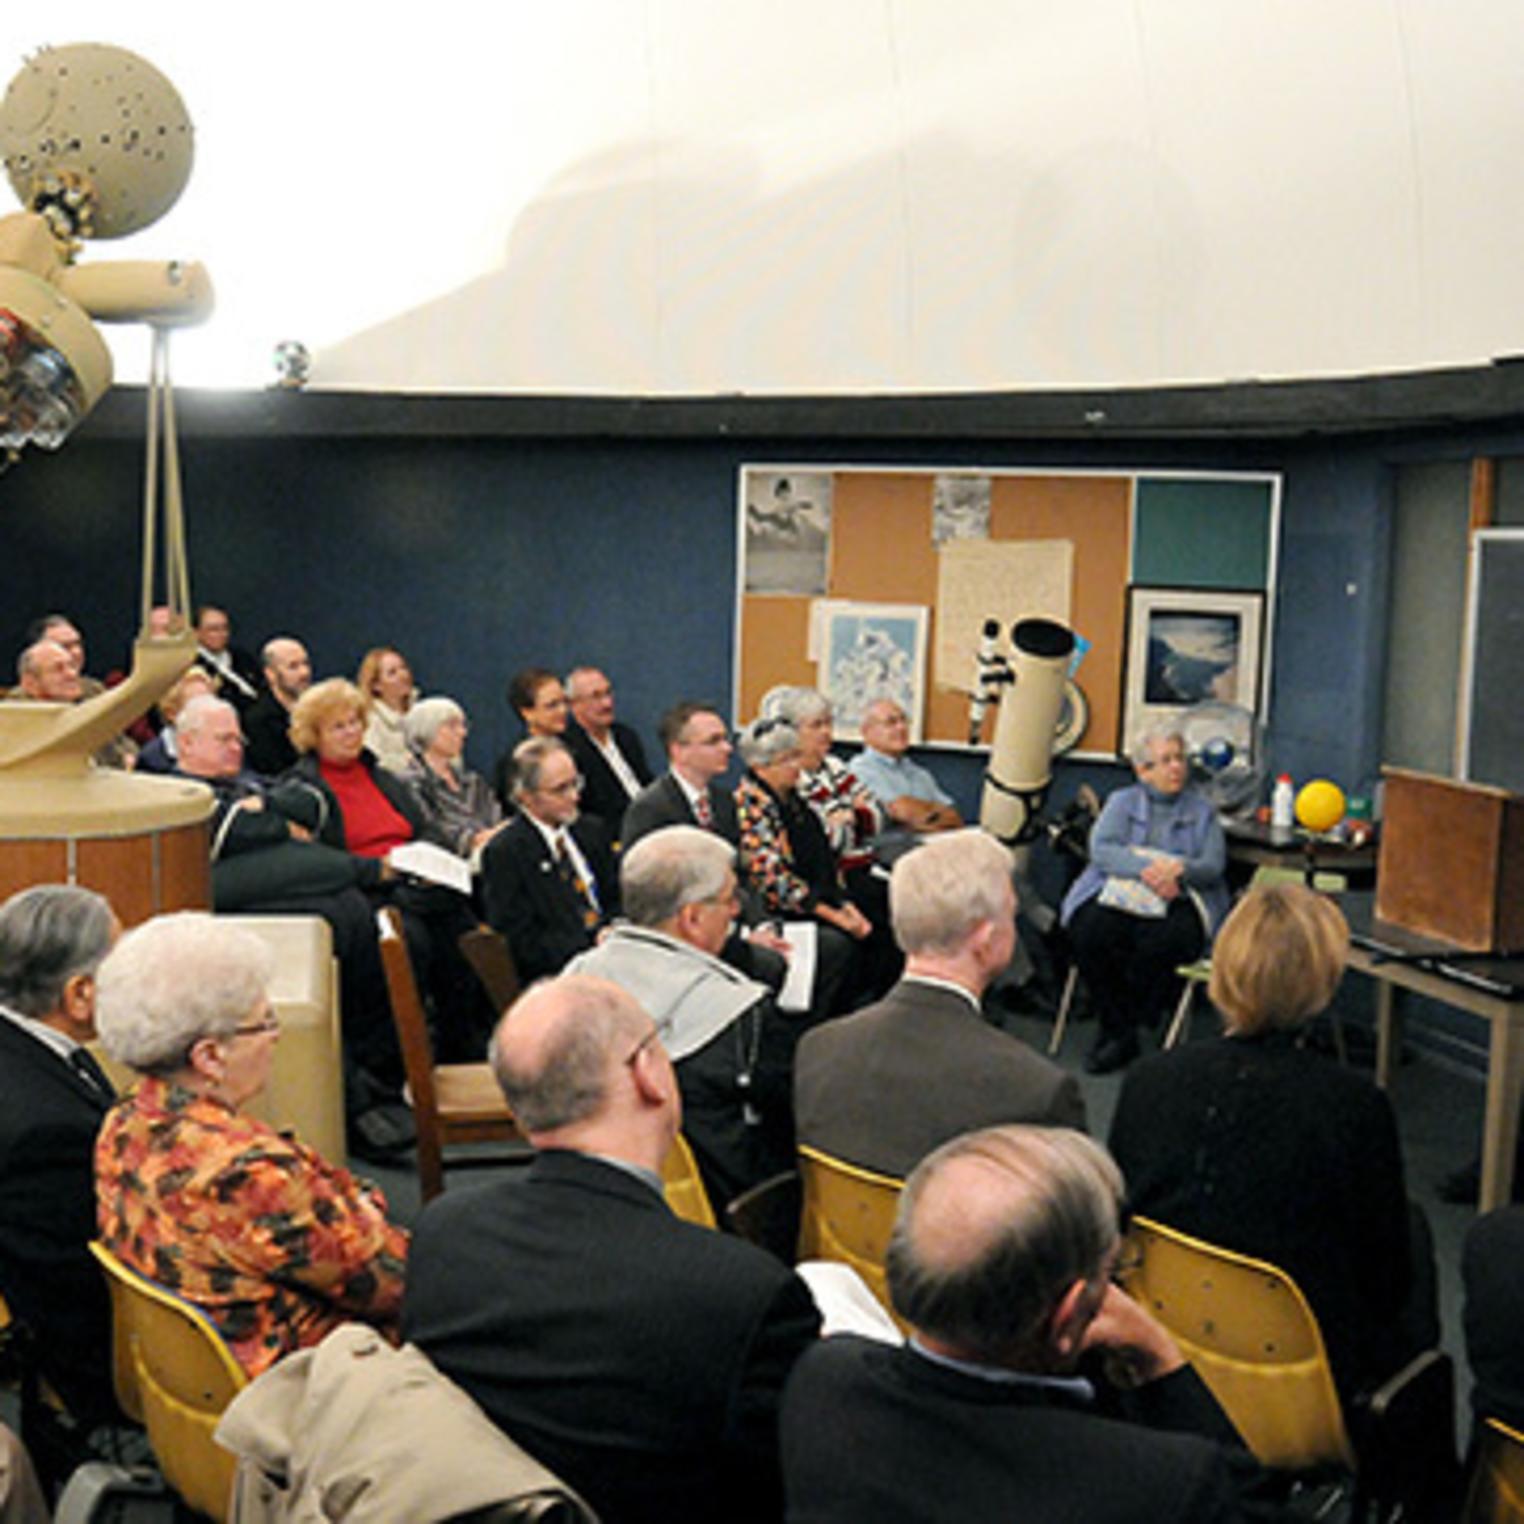 Dibert-Roddick Planetarium